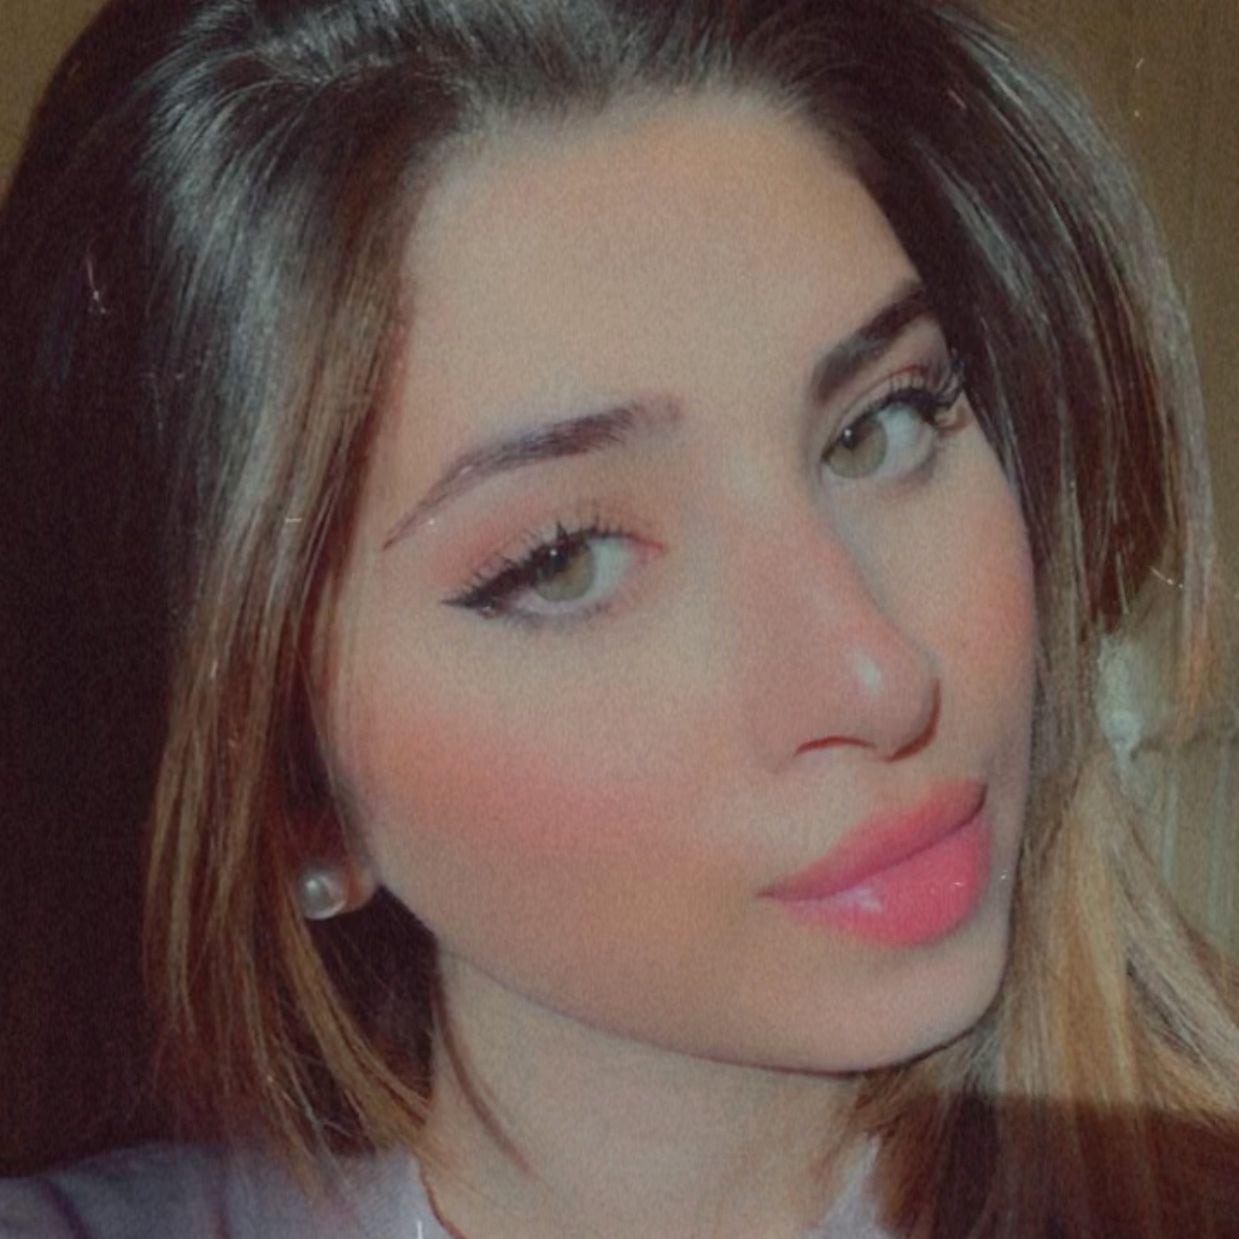 RaghadJalghoum (20)